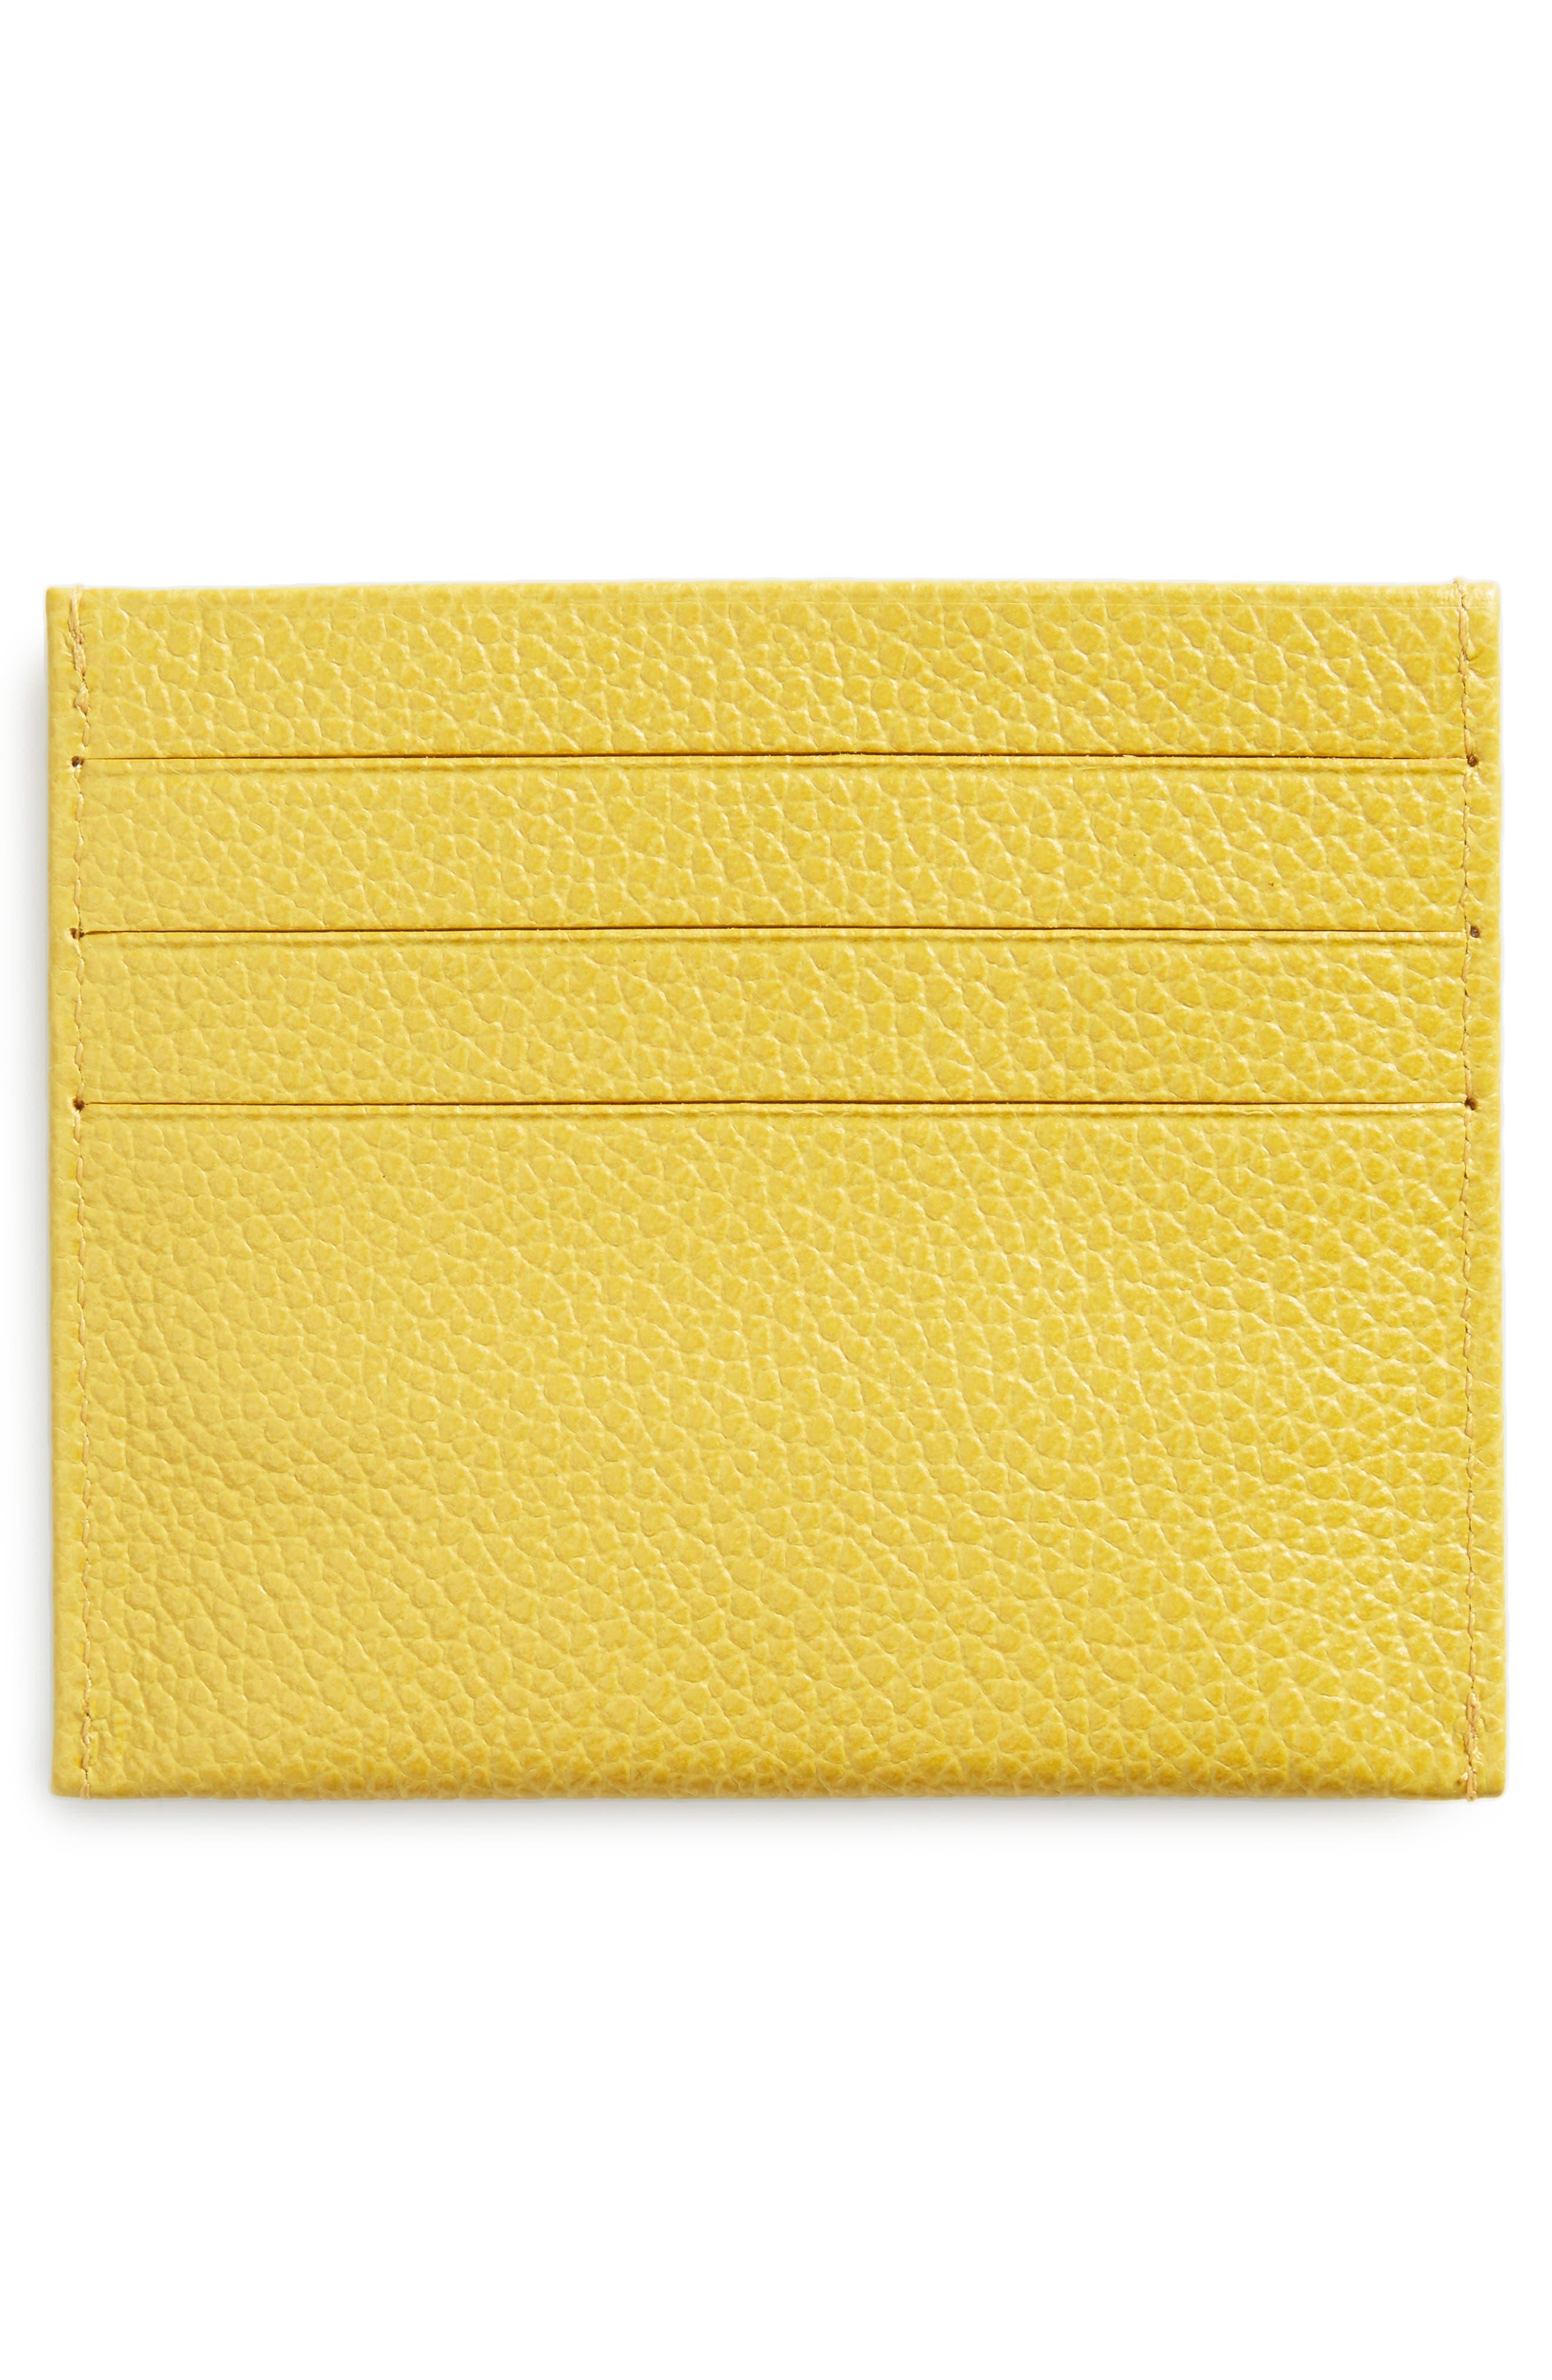 Alternate Image 2  - Longchamp 'Le Foulonne' Pebbled Leather Card Holder